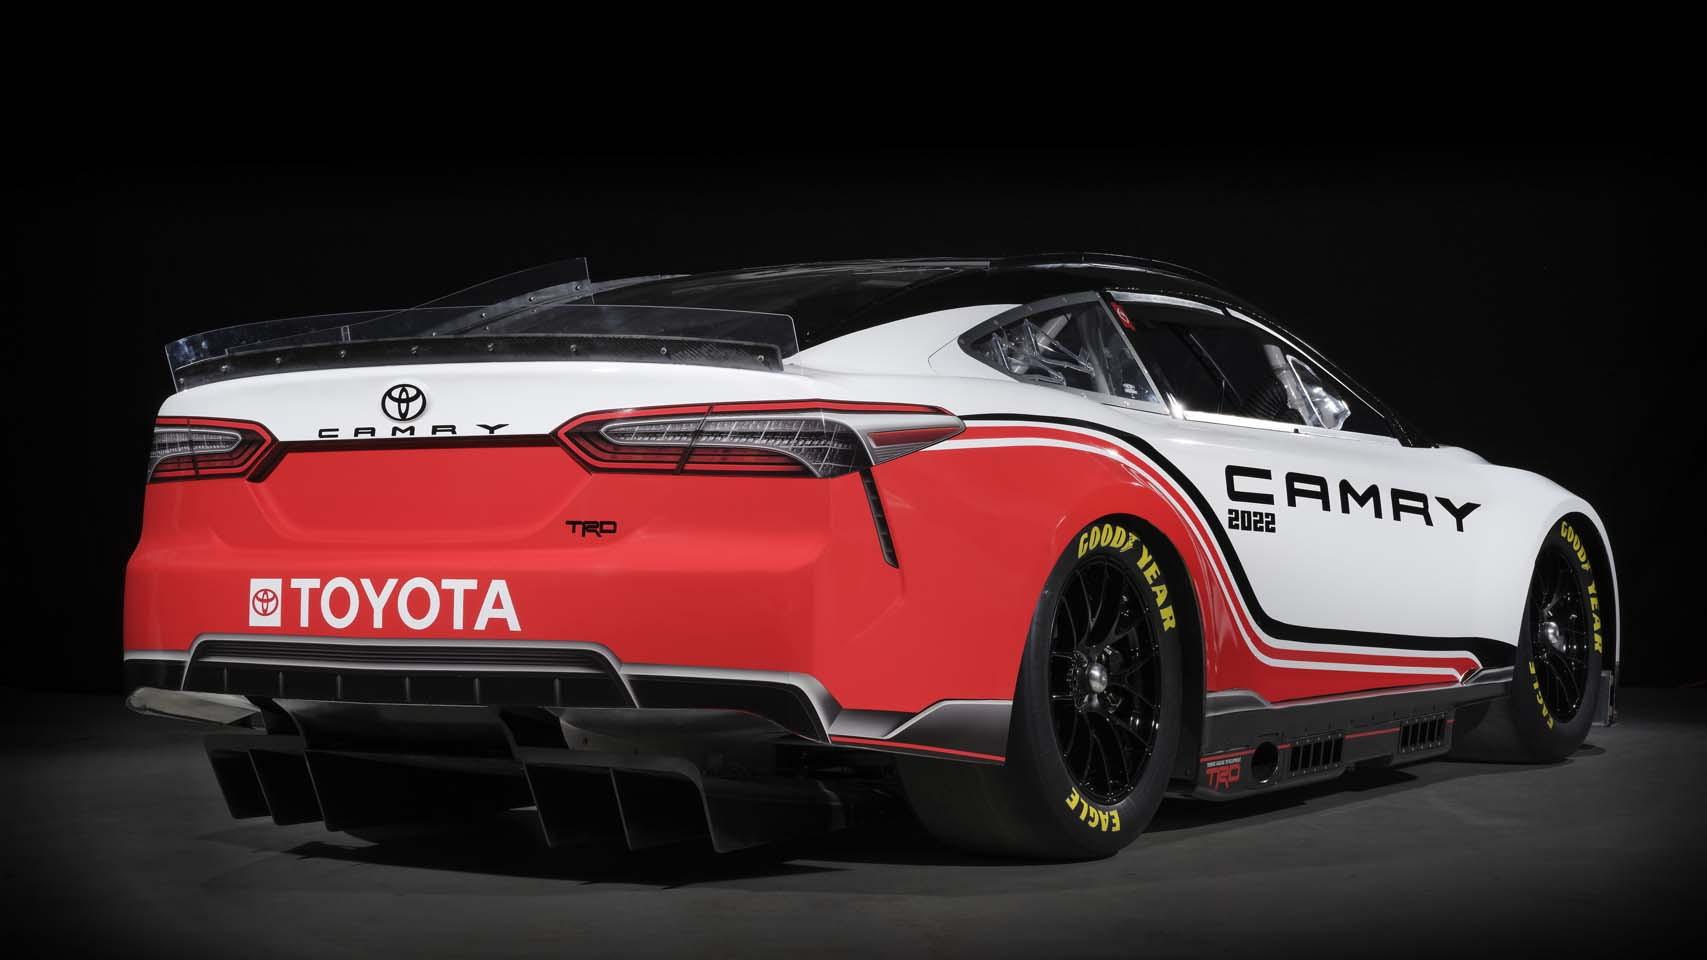 Toyota TRD Camry Next Gen NASCAR race car